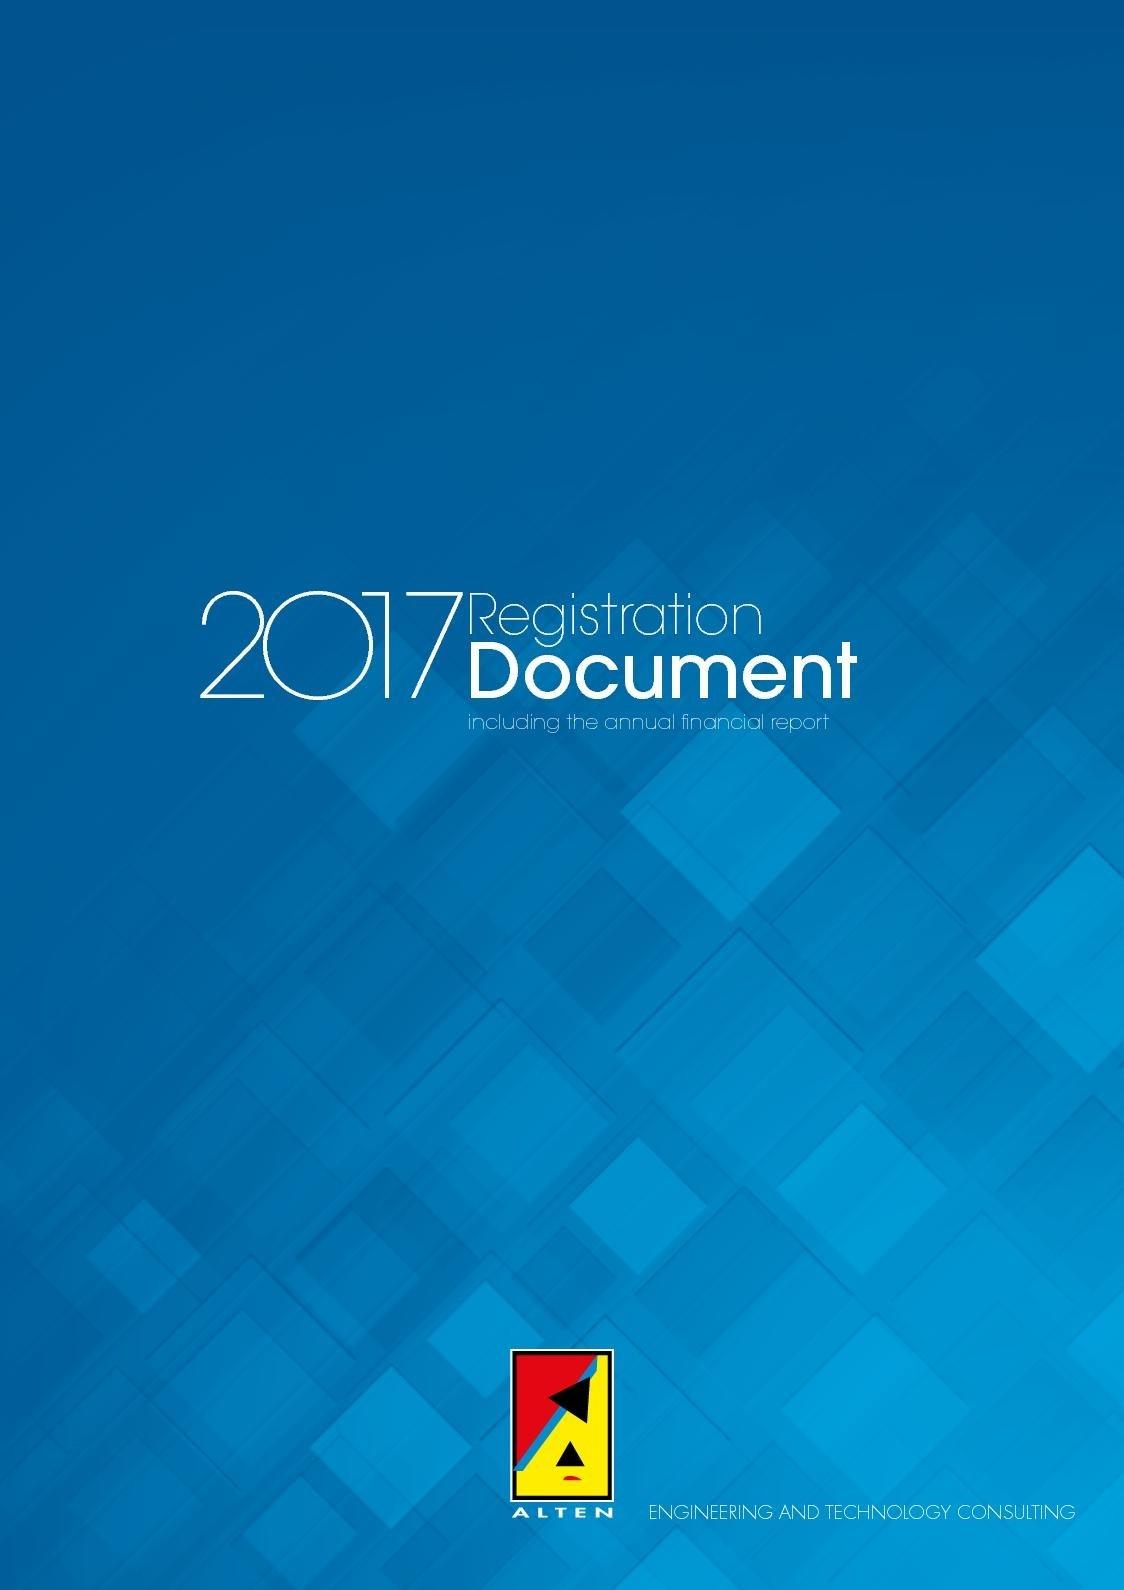 Calaméo - 2017 Alten Registration Document  2021/19 Financial Year Calendar Australia